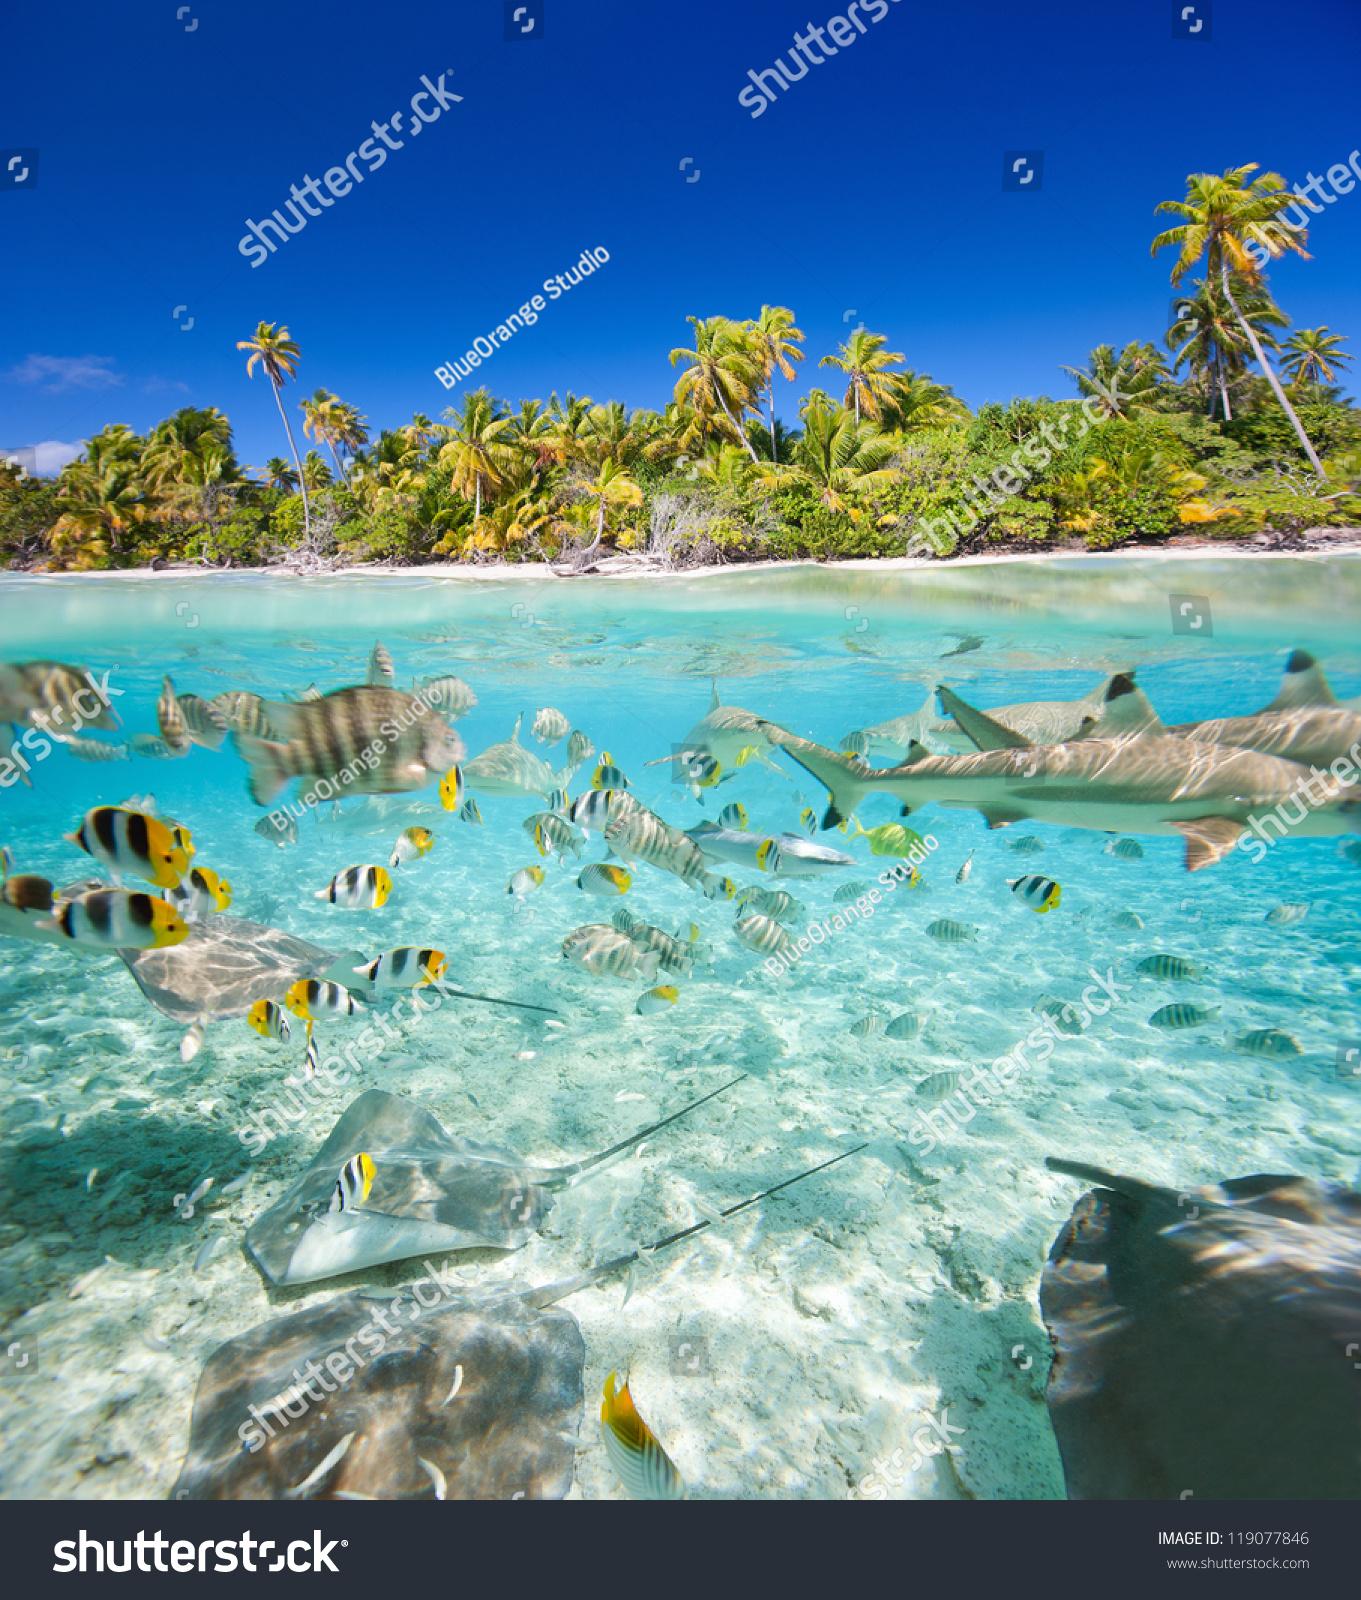 1366x768 beautiful tropical island - photo #35